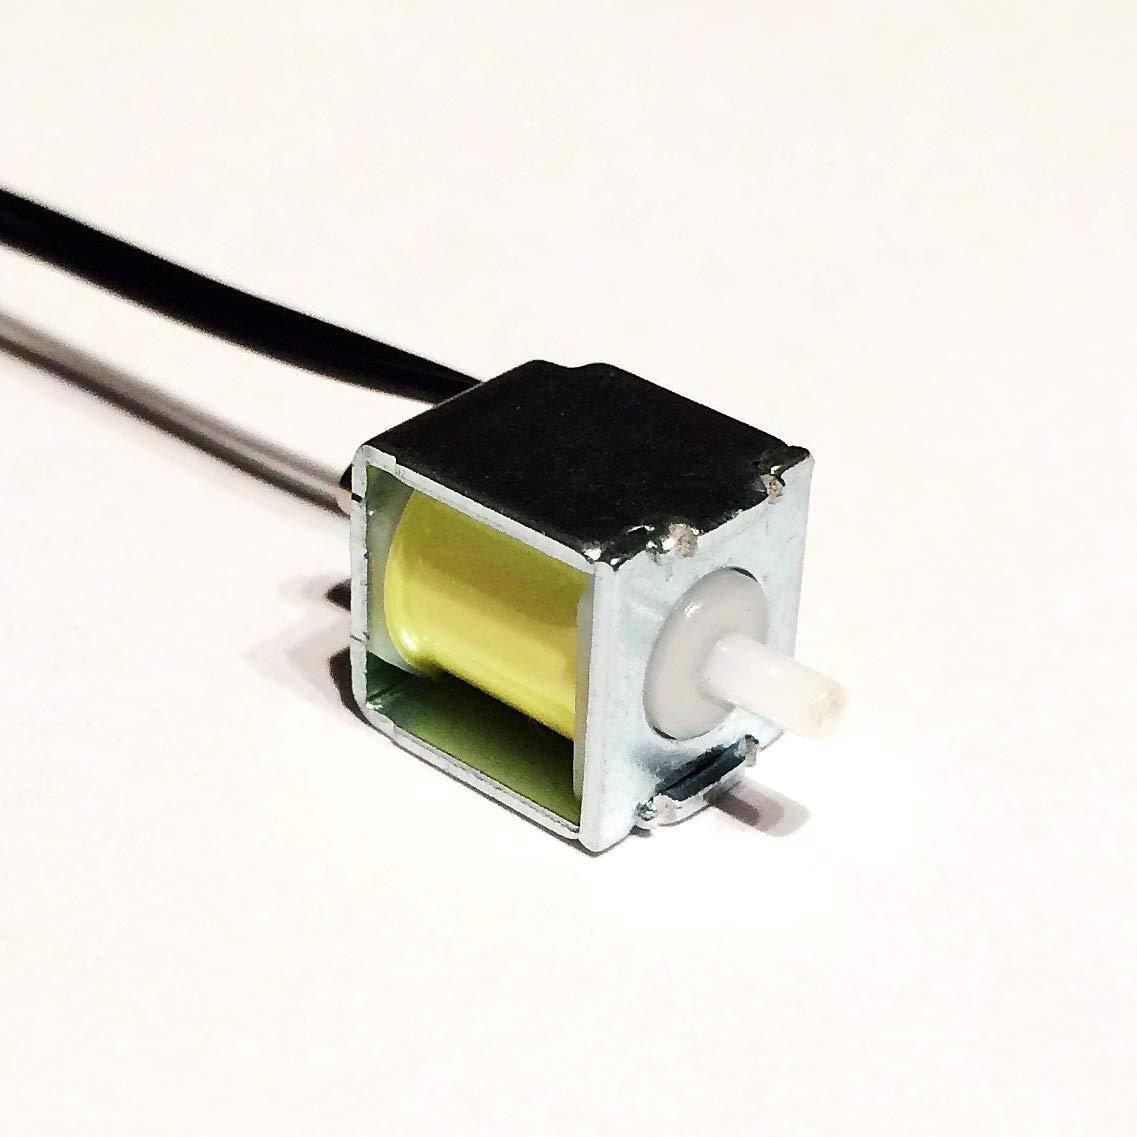 Set of 5pcs 1cmx1cm DC 3V NC Micro air Solenoid Exhaust Pneumatic Blood Pressure Miniature Valve